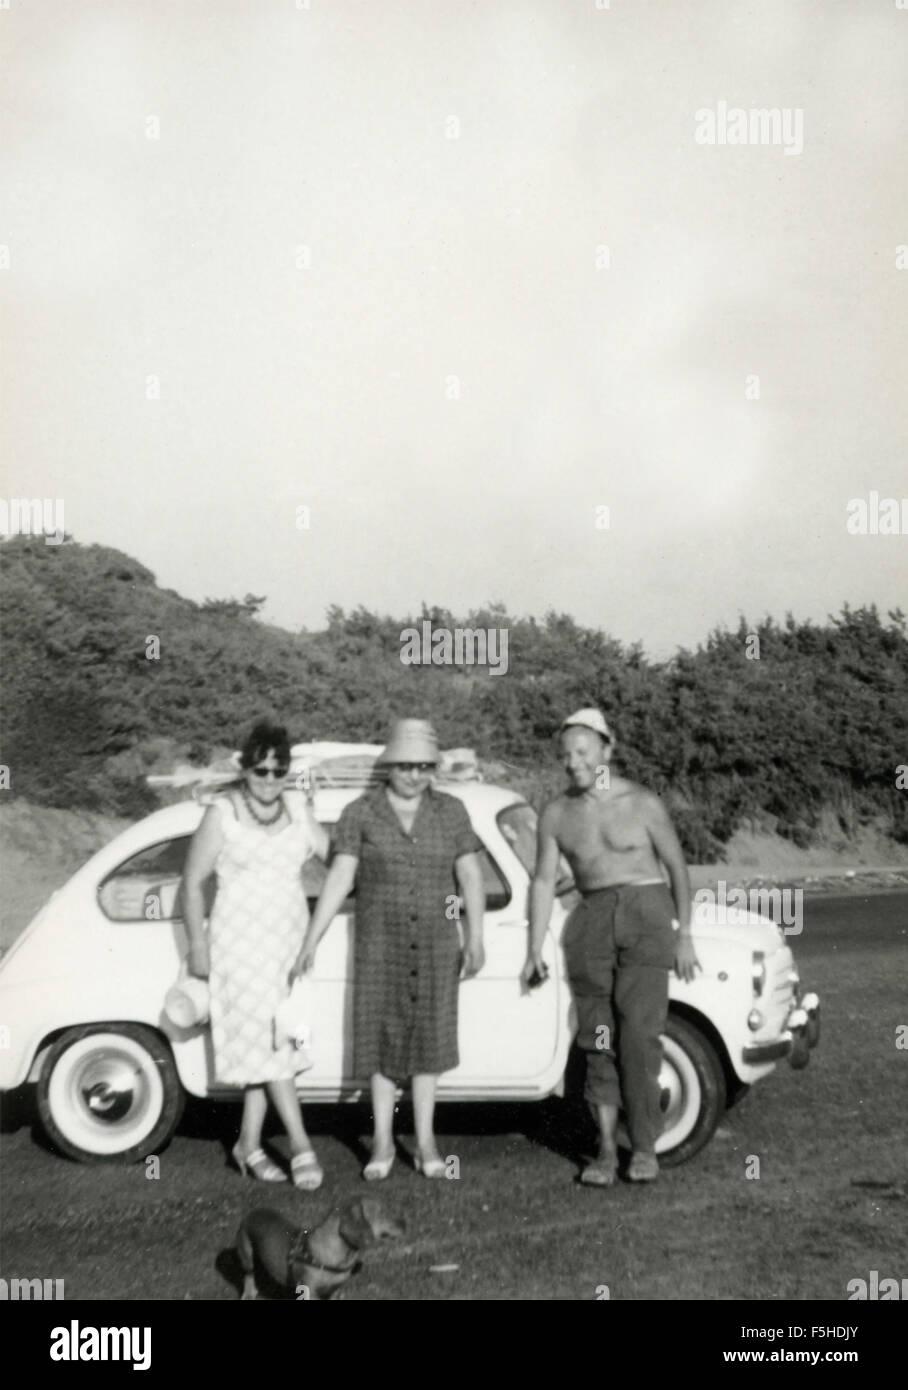 Family with car FIAT 600, Italy - Stock Image